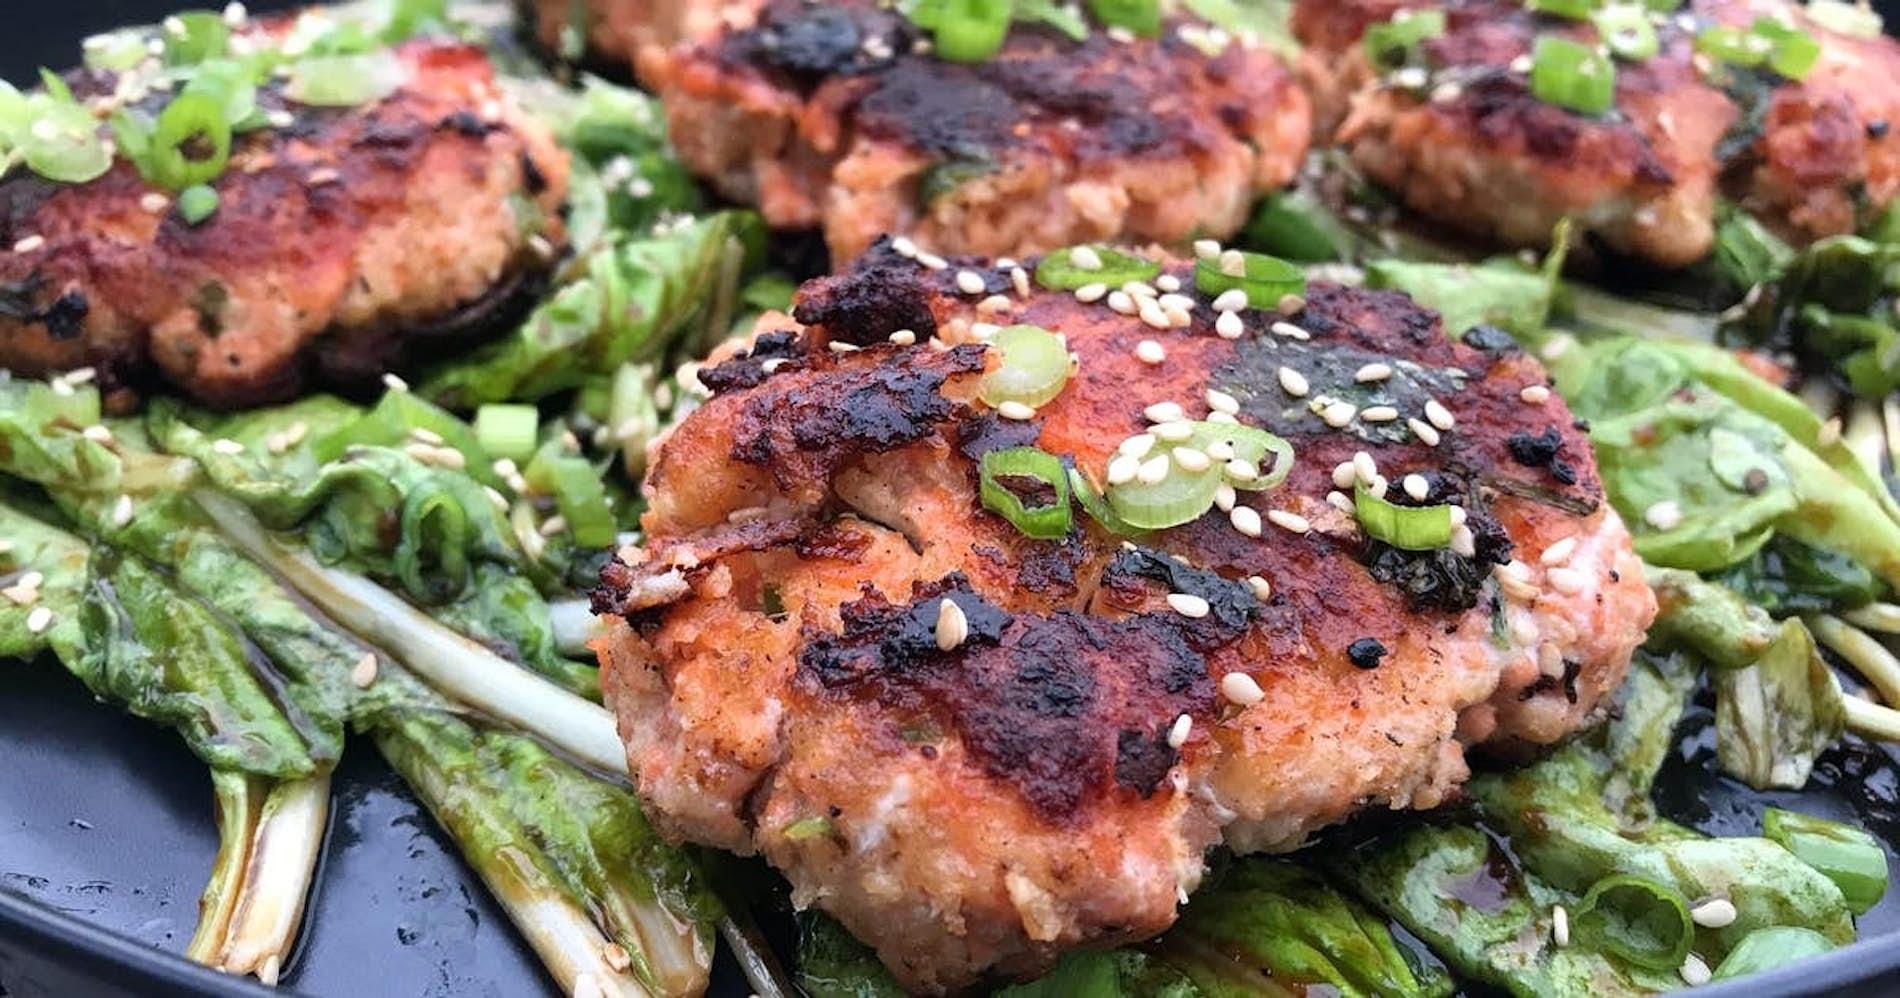 Salmon Cakes & Asian Greens